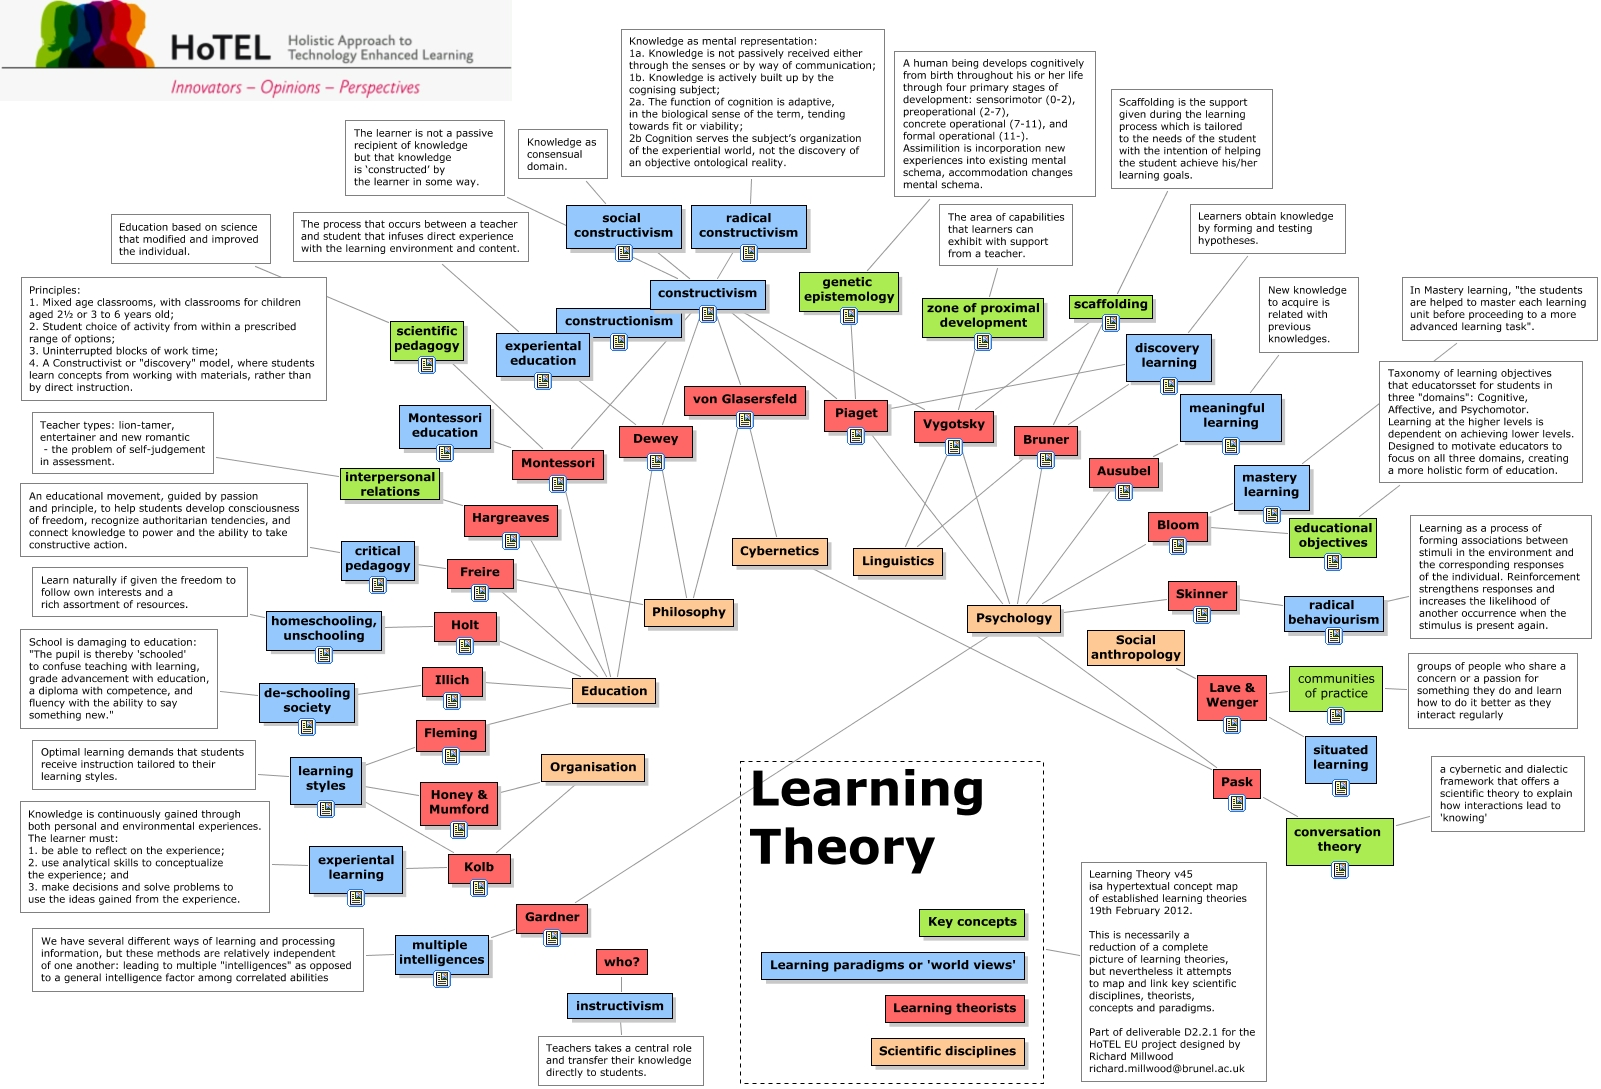 Learning Theory v5.cmap